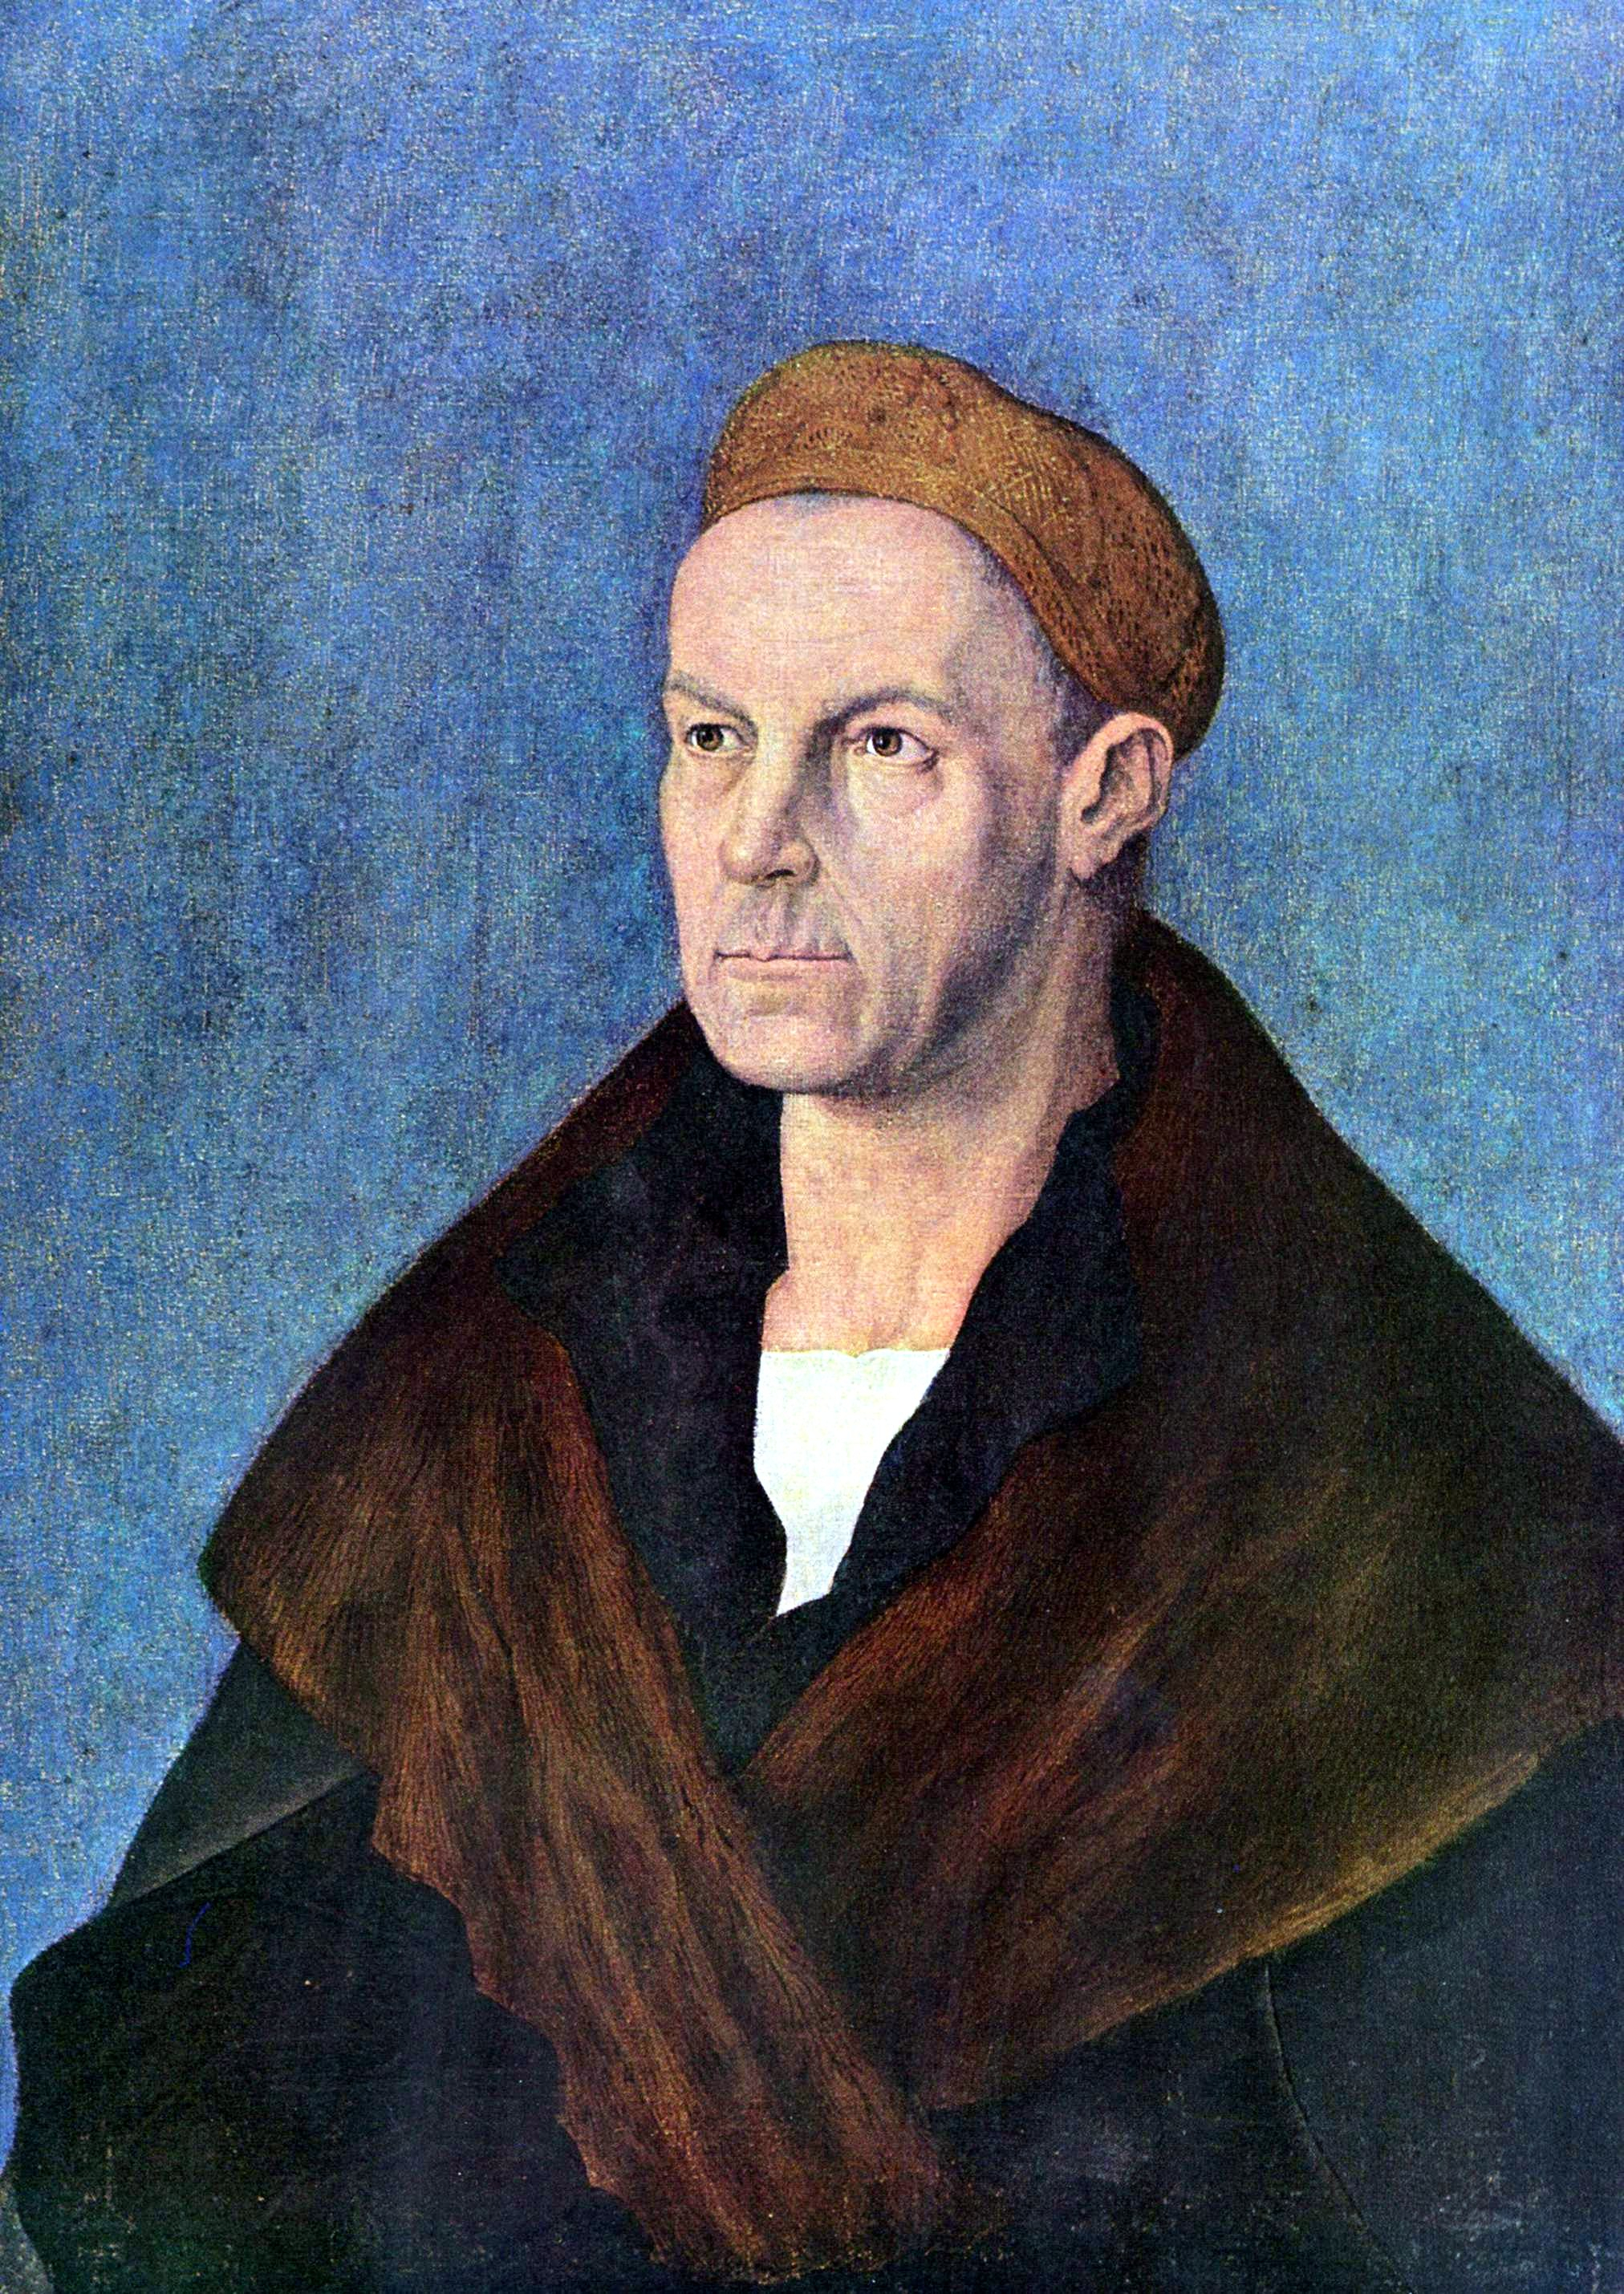 Jacob Fugger, portrait by Albrecht Dürer, 1518 (Staatsgalerie Altdeutsche Meister)